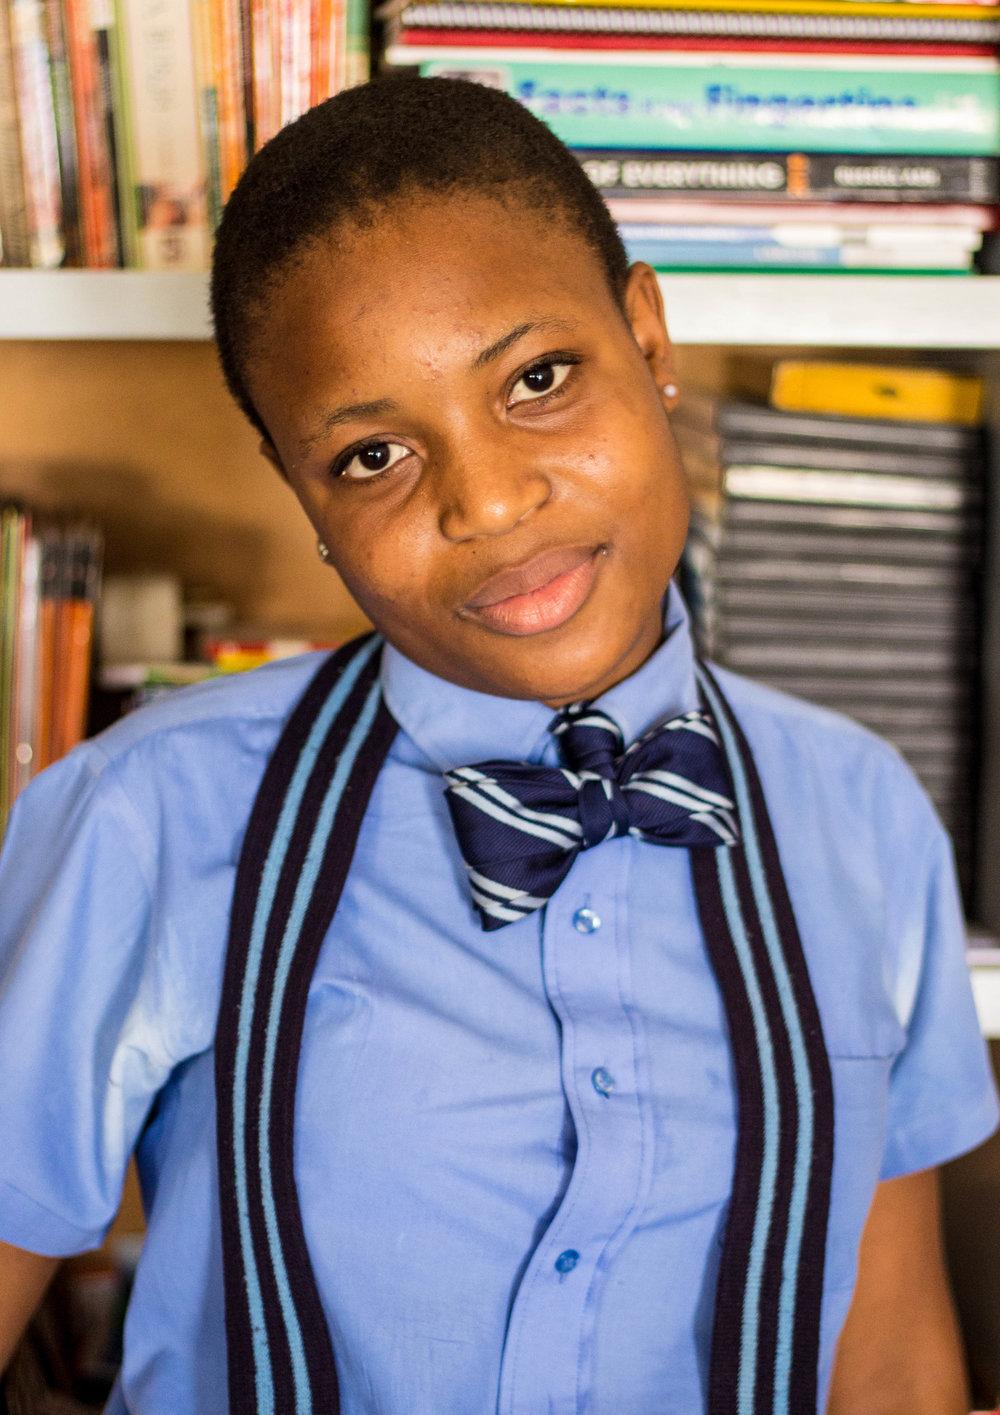 """I am intelligent. I will finish my education."" - Proginata Nyambi"